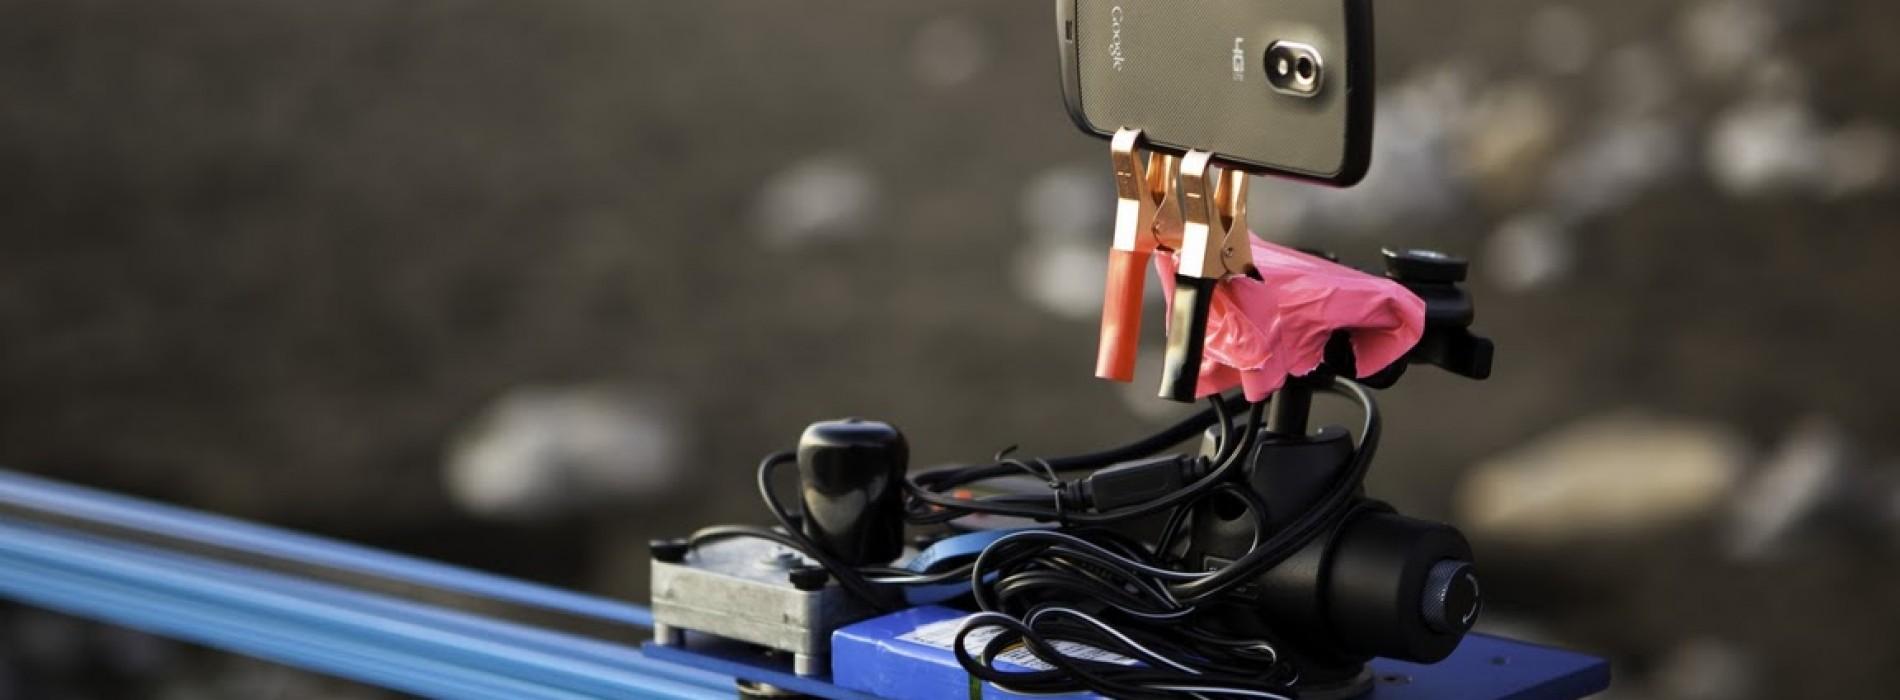 Need Proof of Verizon's Galaxy Nexus?